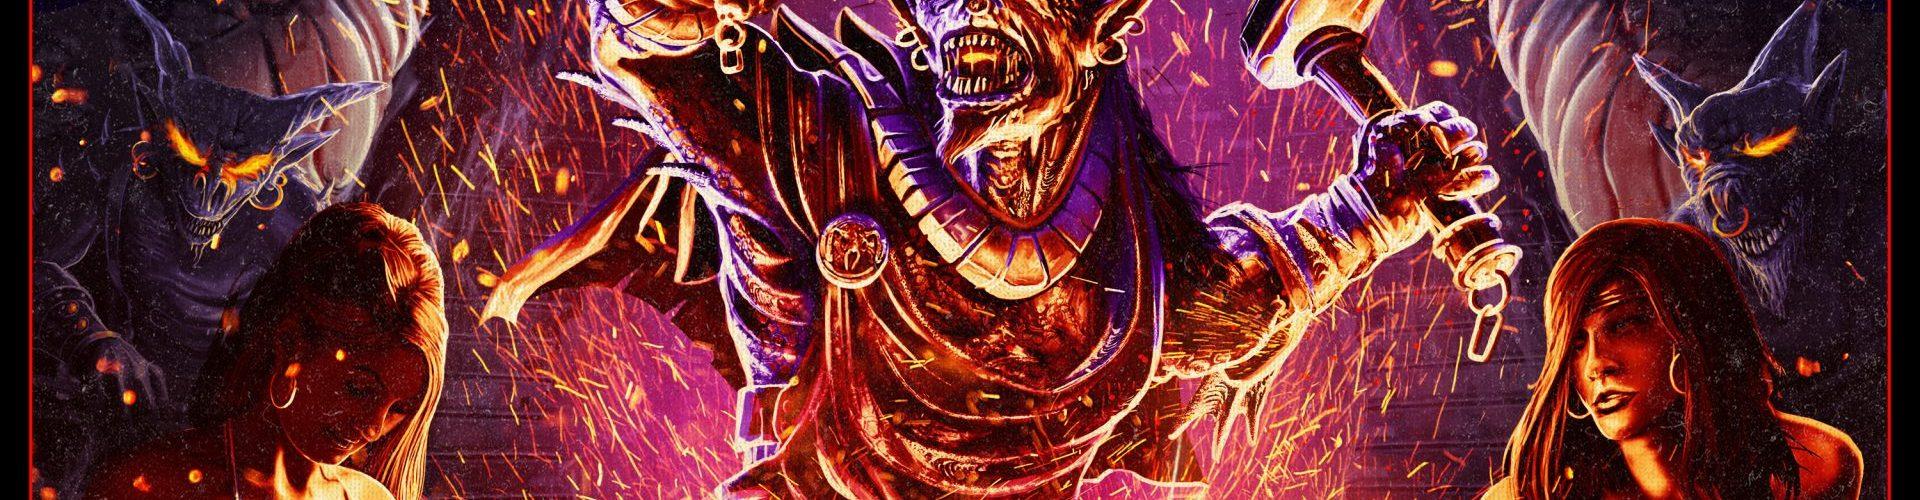 Metal-Review: MAGIC KINGDOM – METALMIGHTY